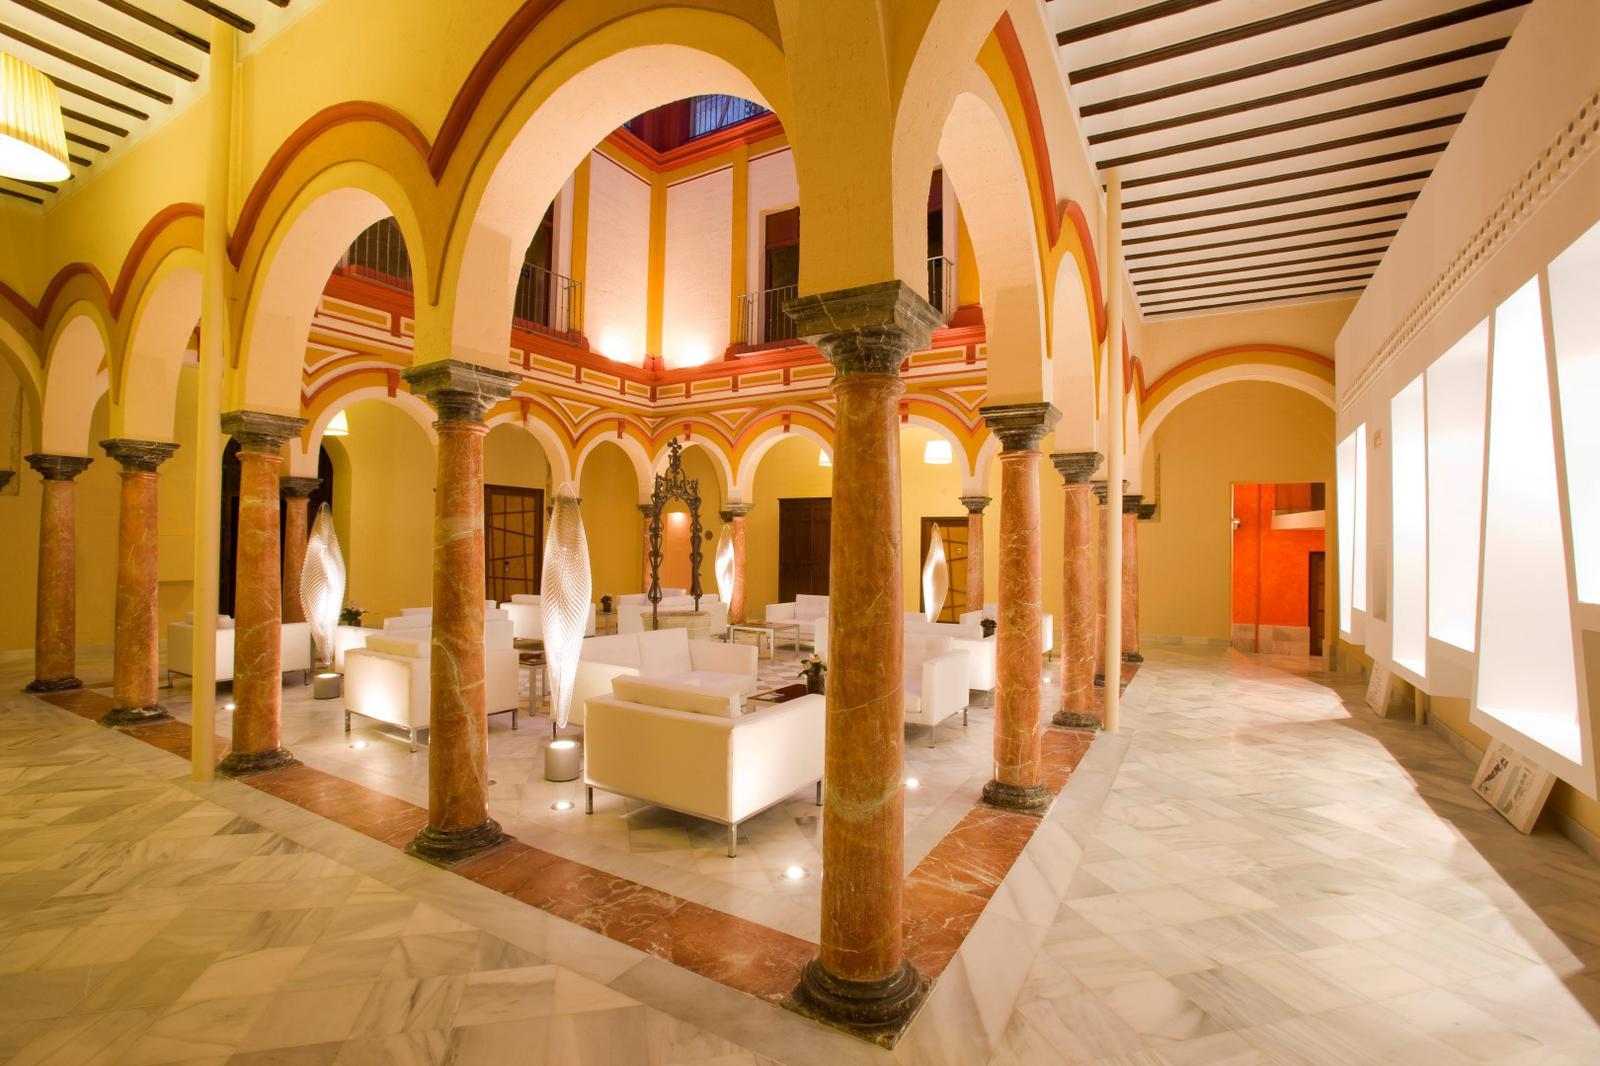 fiestas españolas interés turístico internacional abba_palacio (Large)